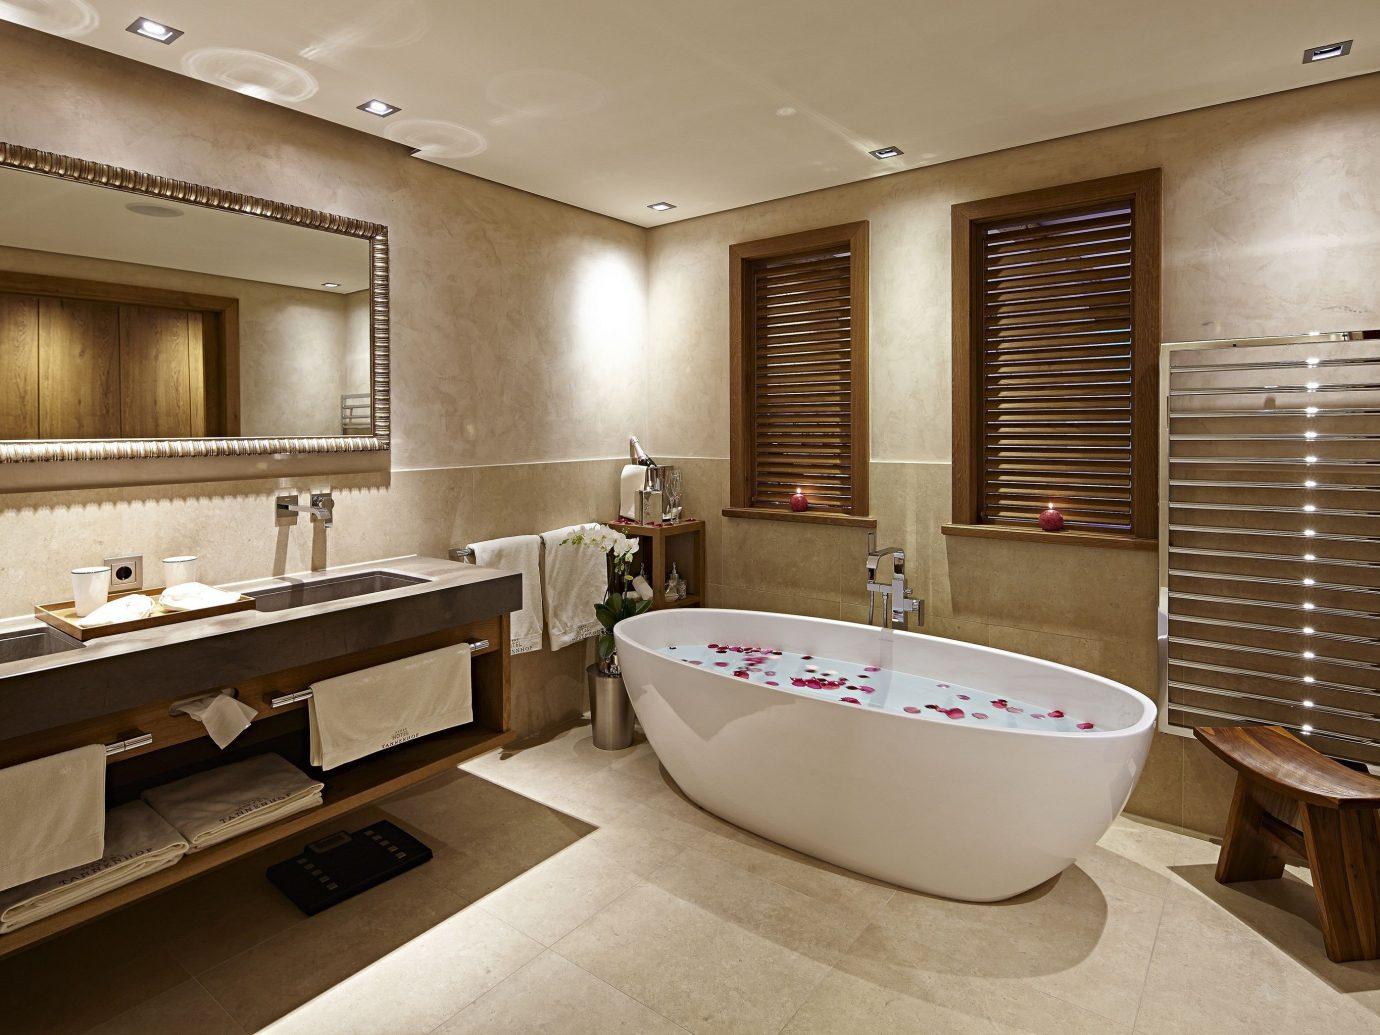 All-Inclusive Resorts Hotels indoor floor wall window room ceiling bathroom interior design Suite estate flooring sink interior designer tub Bath bathtub